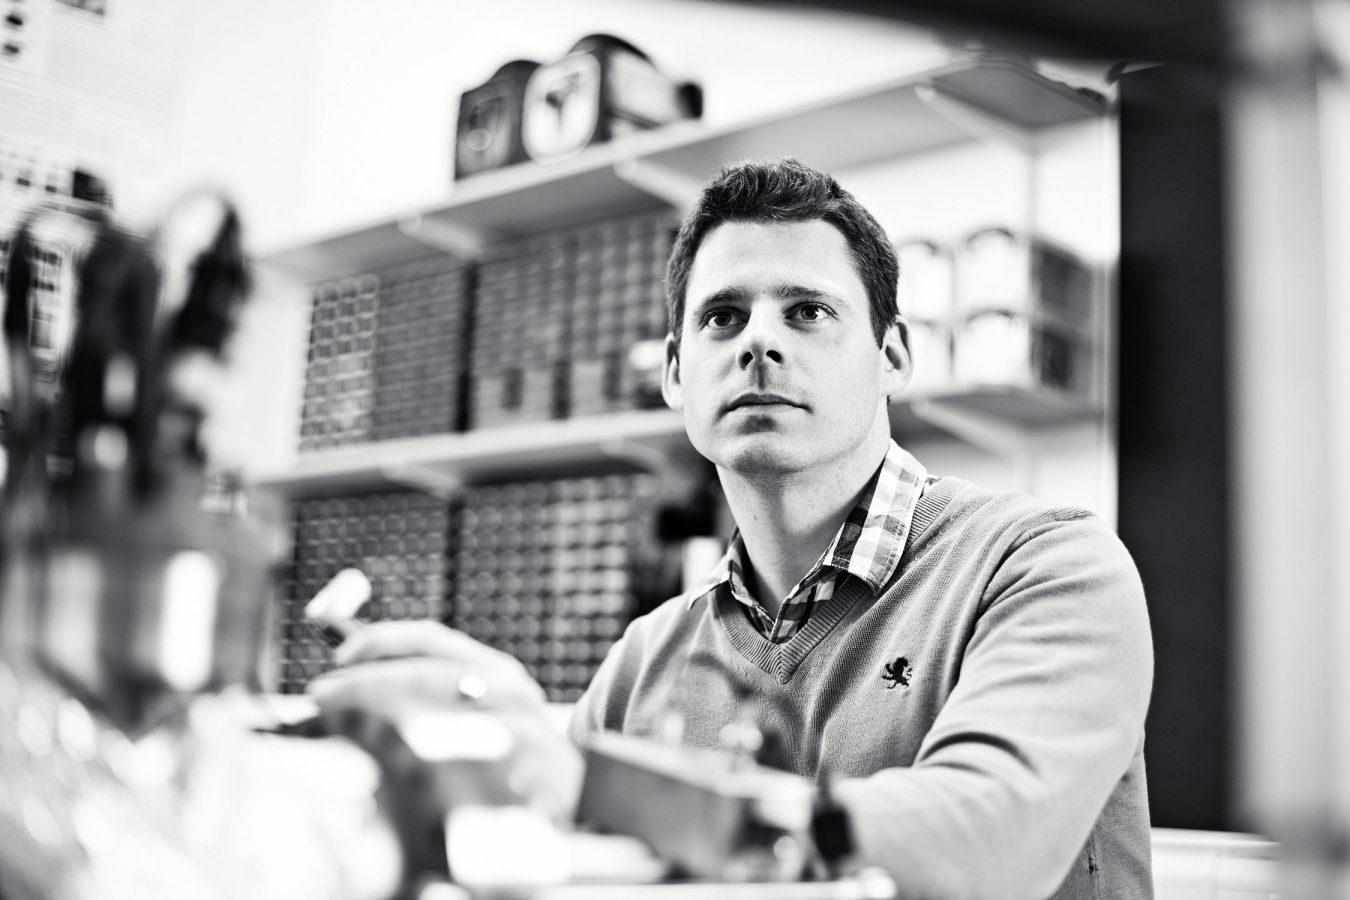 university-of-cambridge-lab-photography-portrait-black-and-white